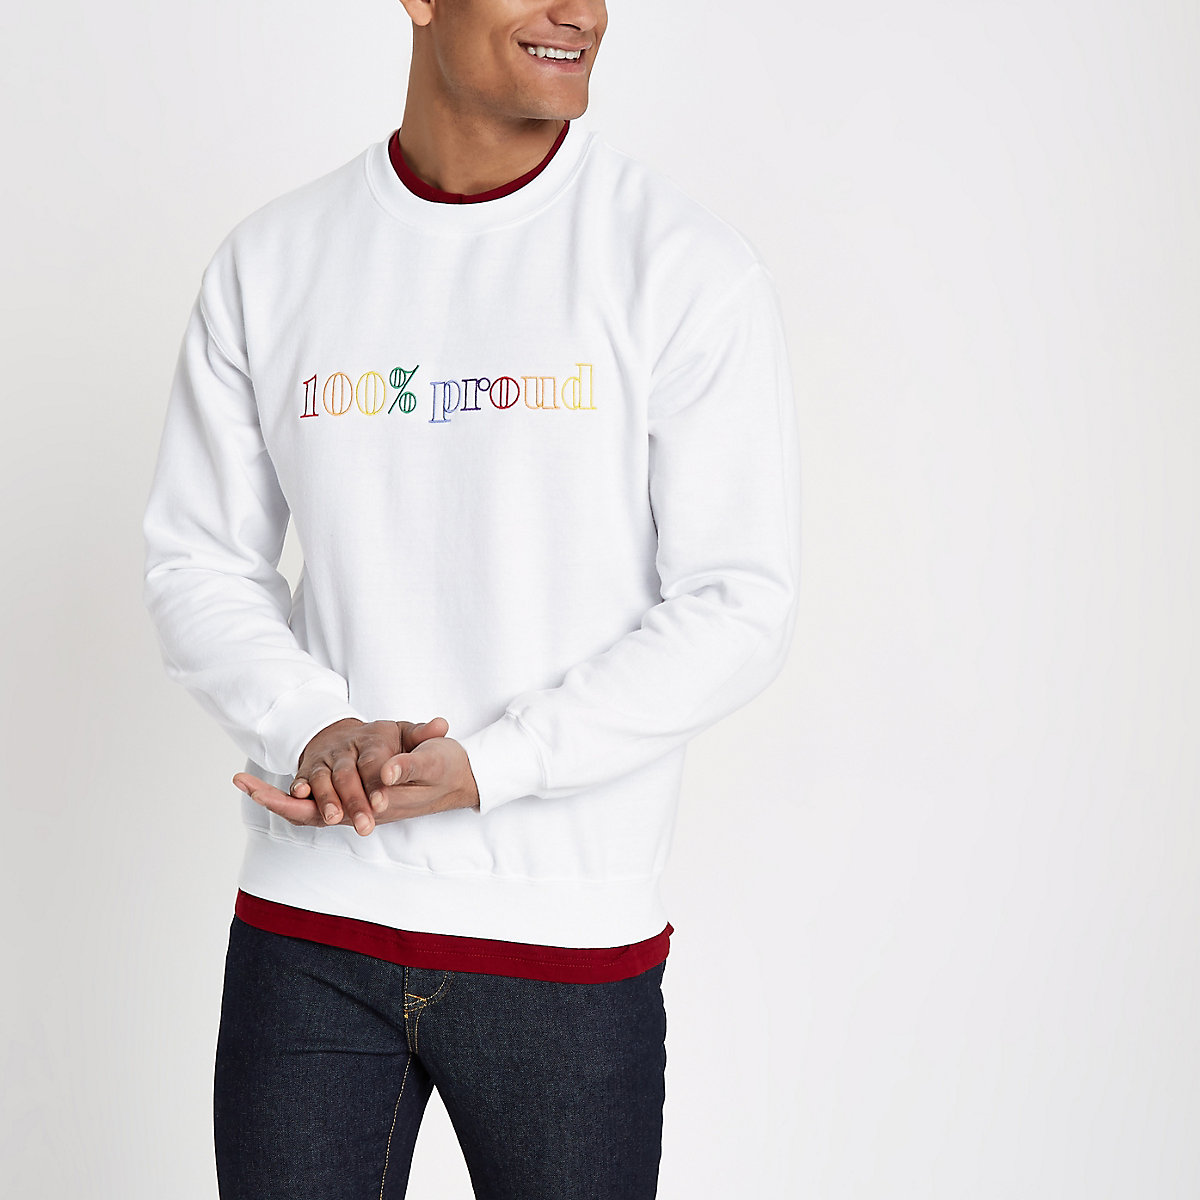 White '100% proud' pride sweatshirt